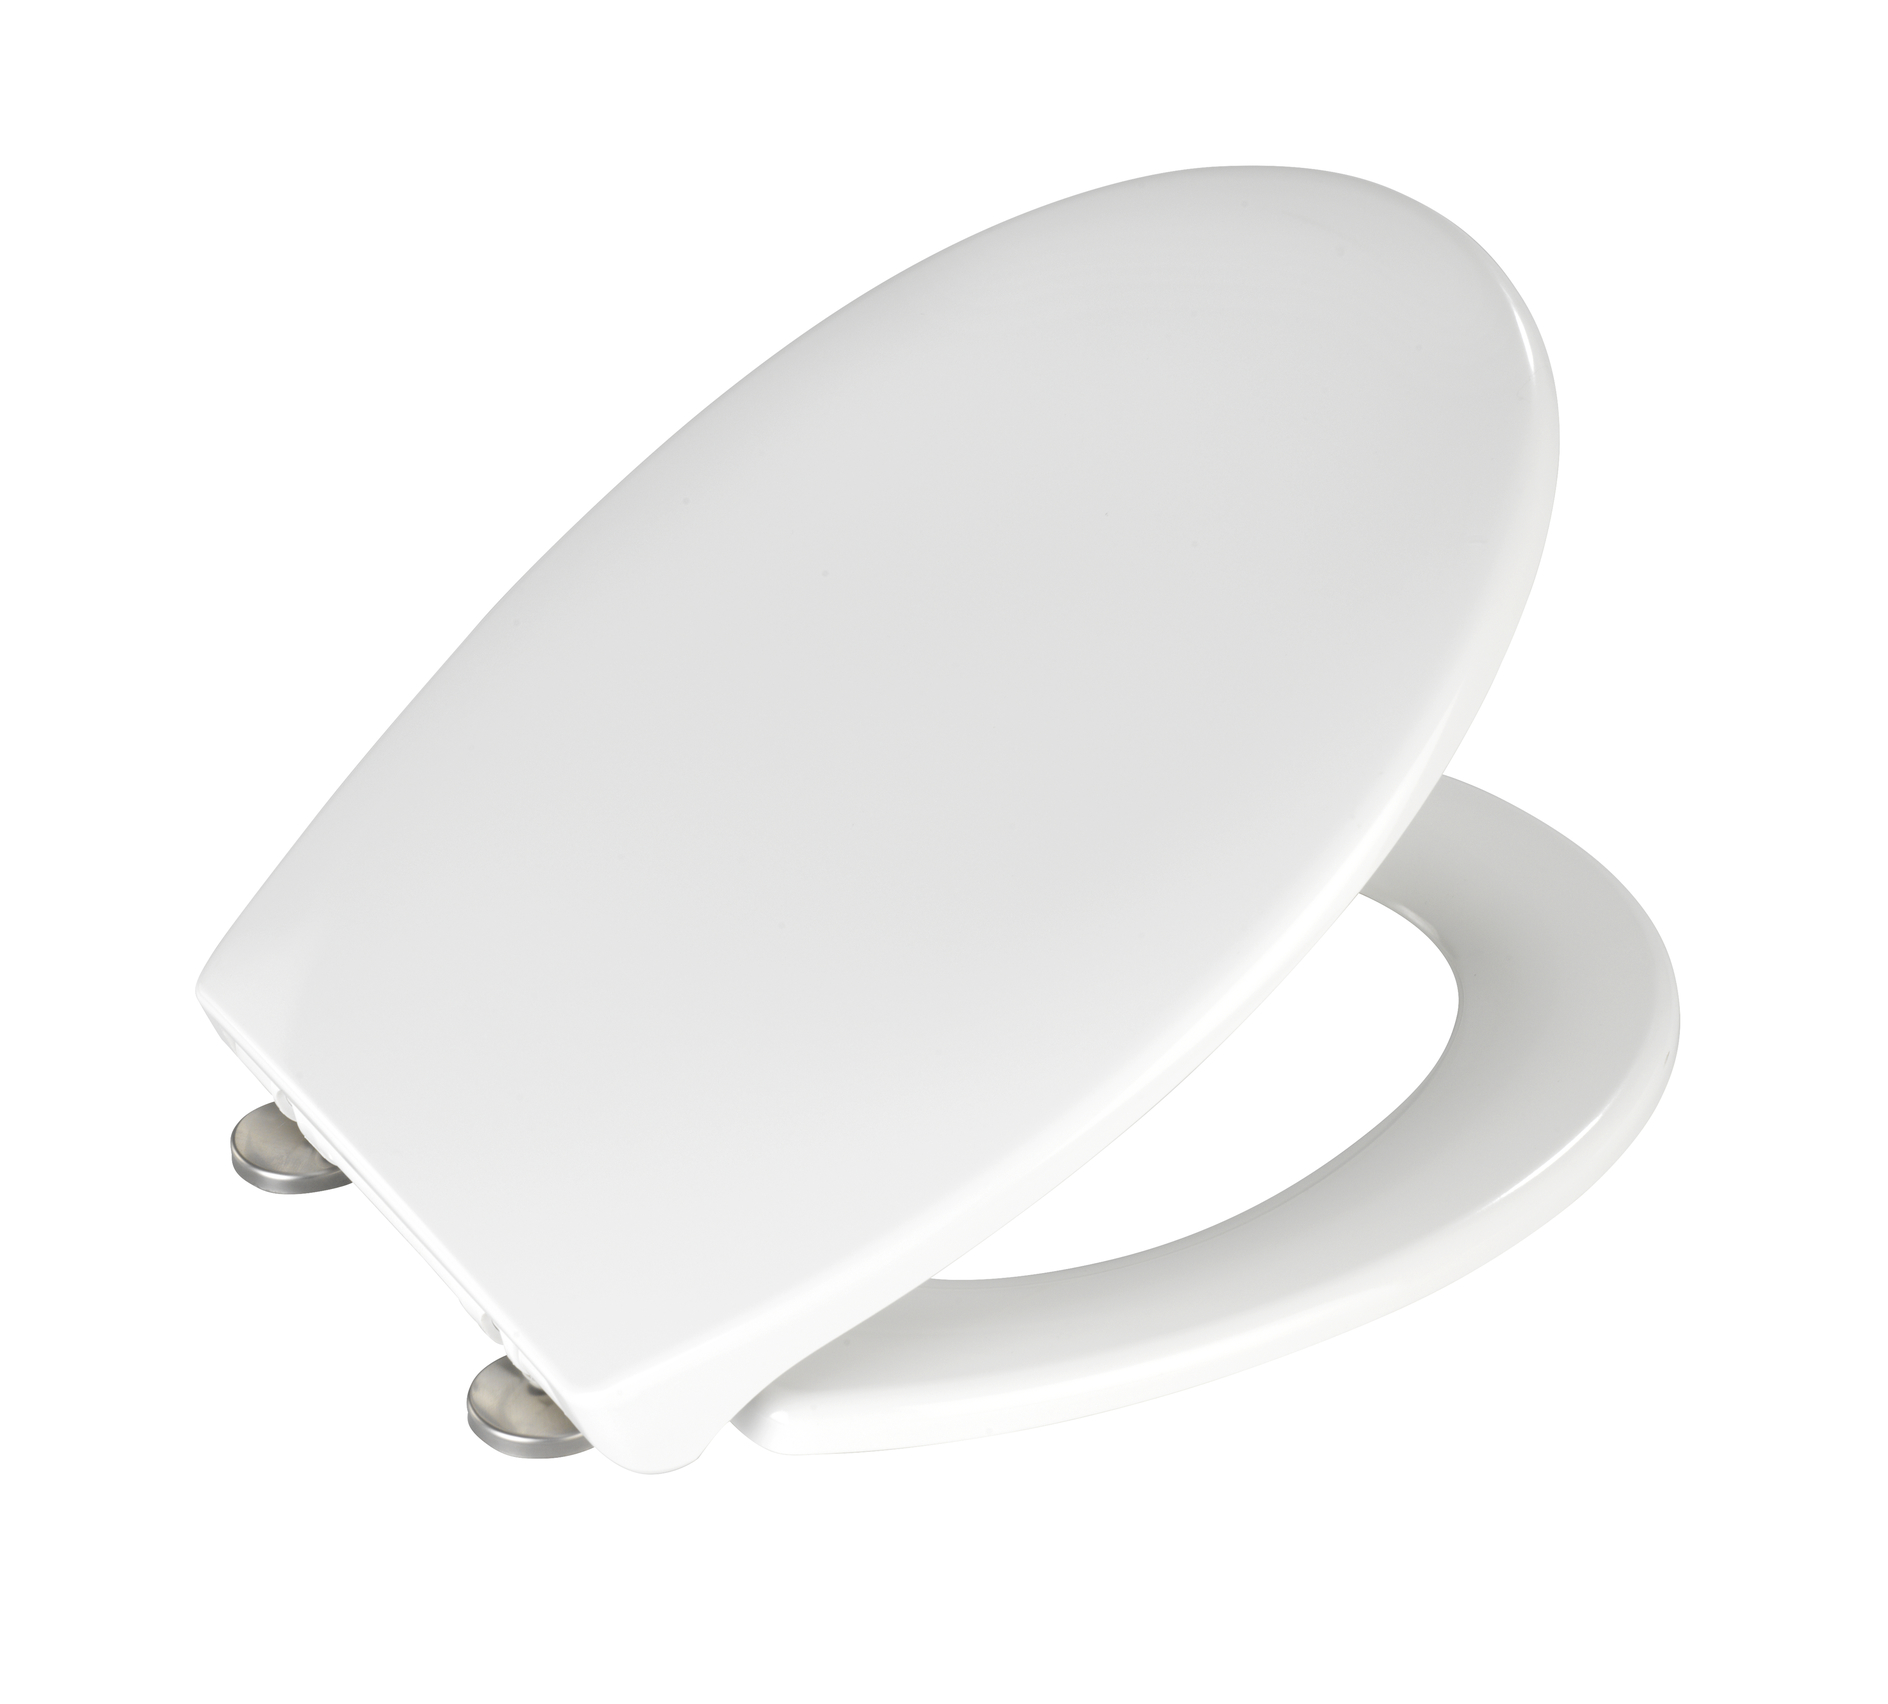 wc sitz kinder toilettensitz kindersitz absenkautomatik toilettentrainer ebay. Black Bedroom Furniture Sets. Home Design Ideas